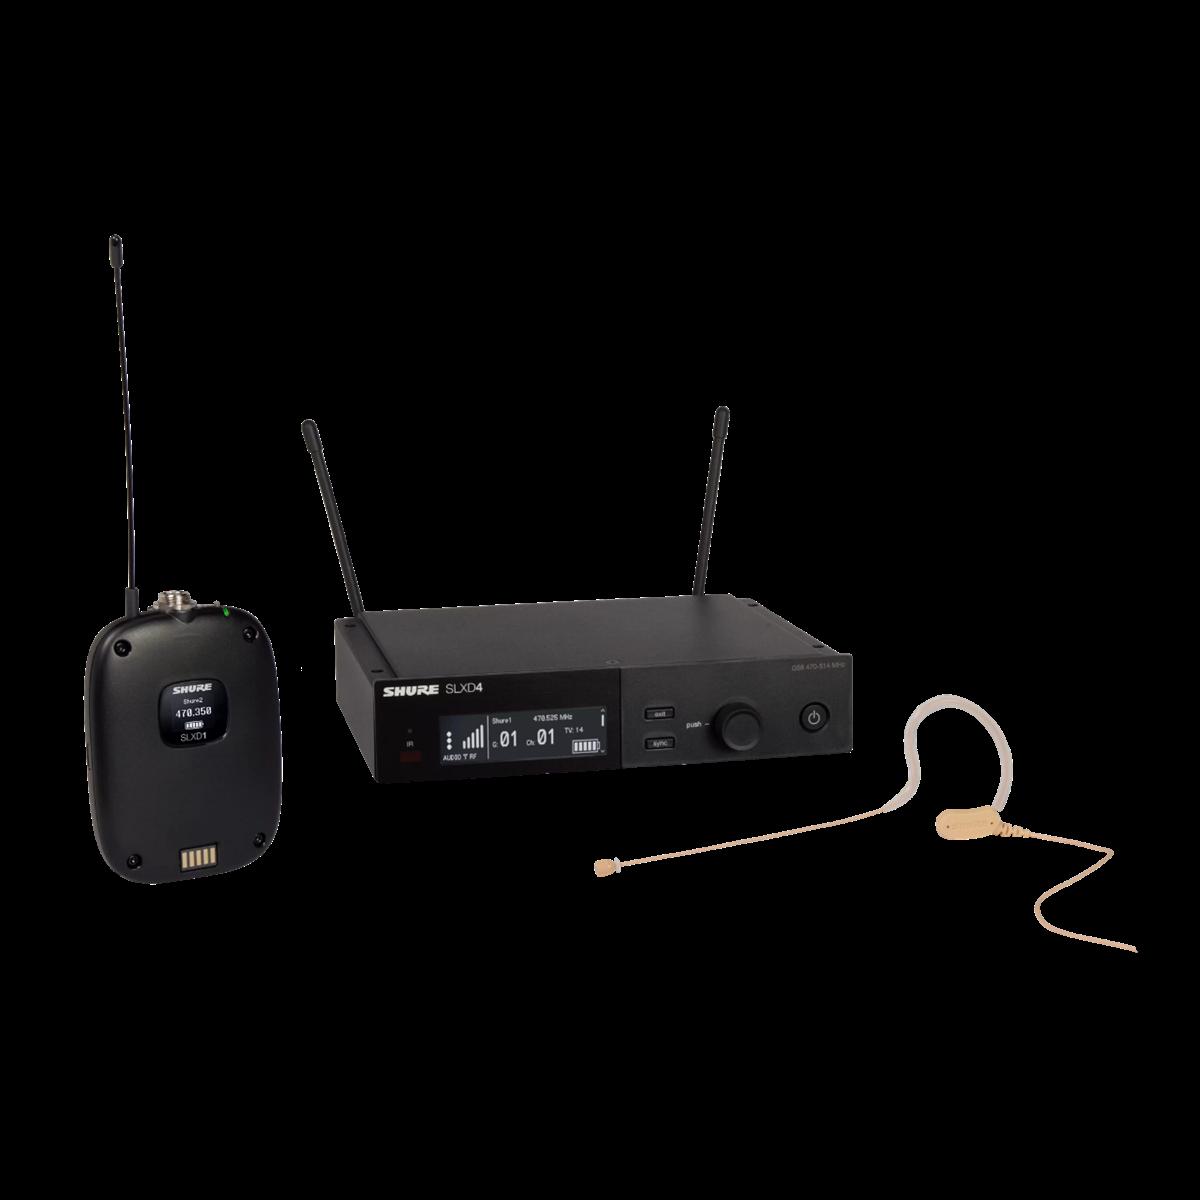 Shure SLX-D Beltpack system MX153T Tan Earset - 518-562MHz